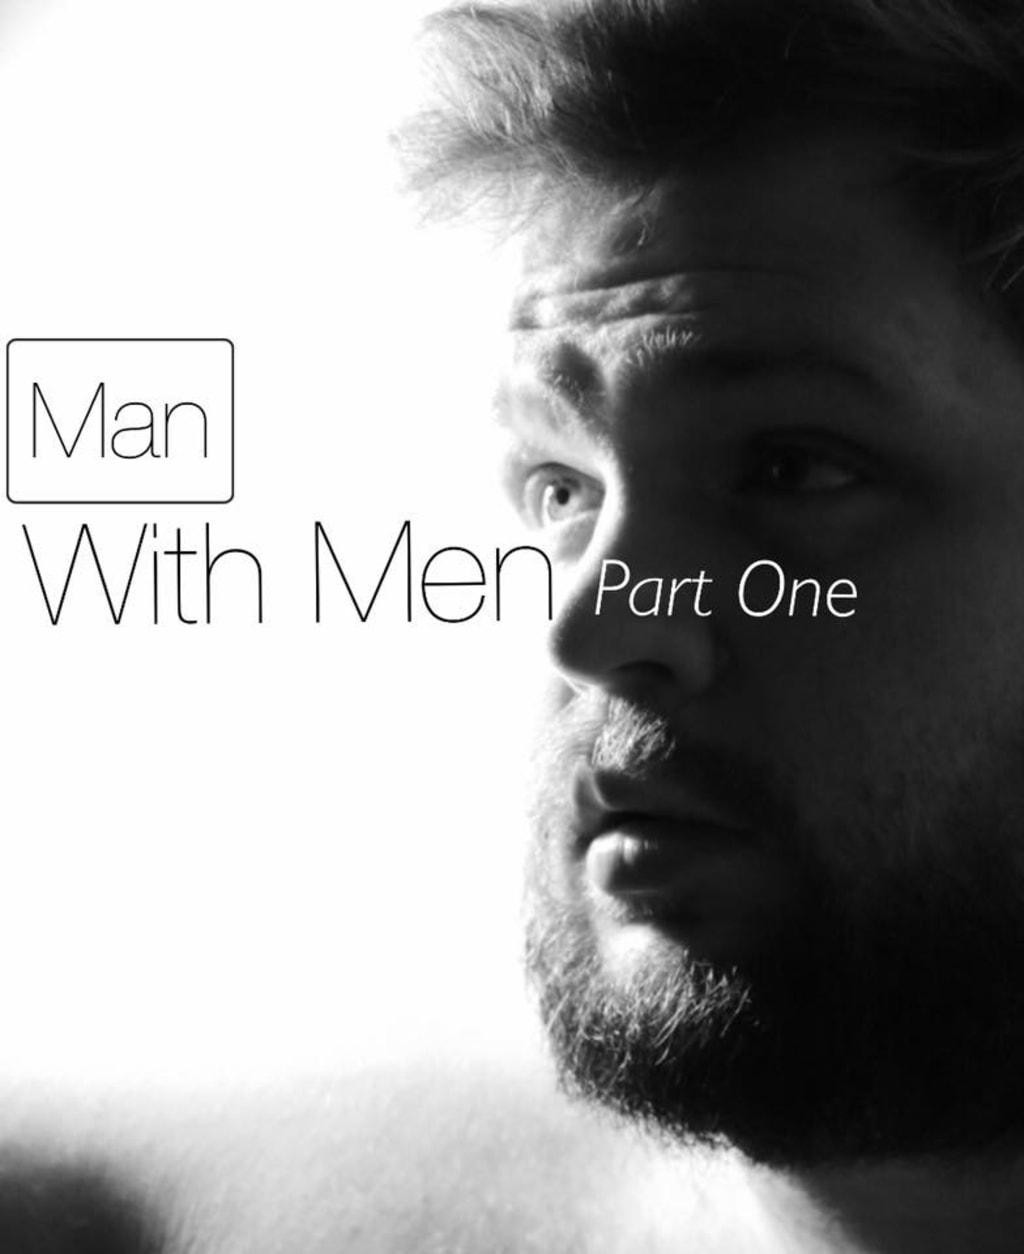 Man With Men